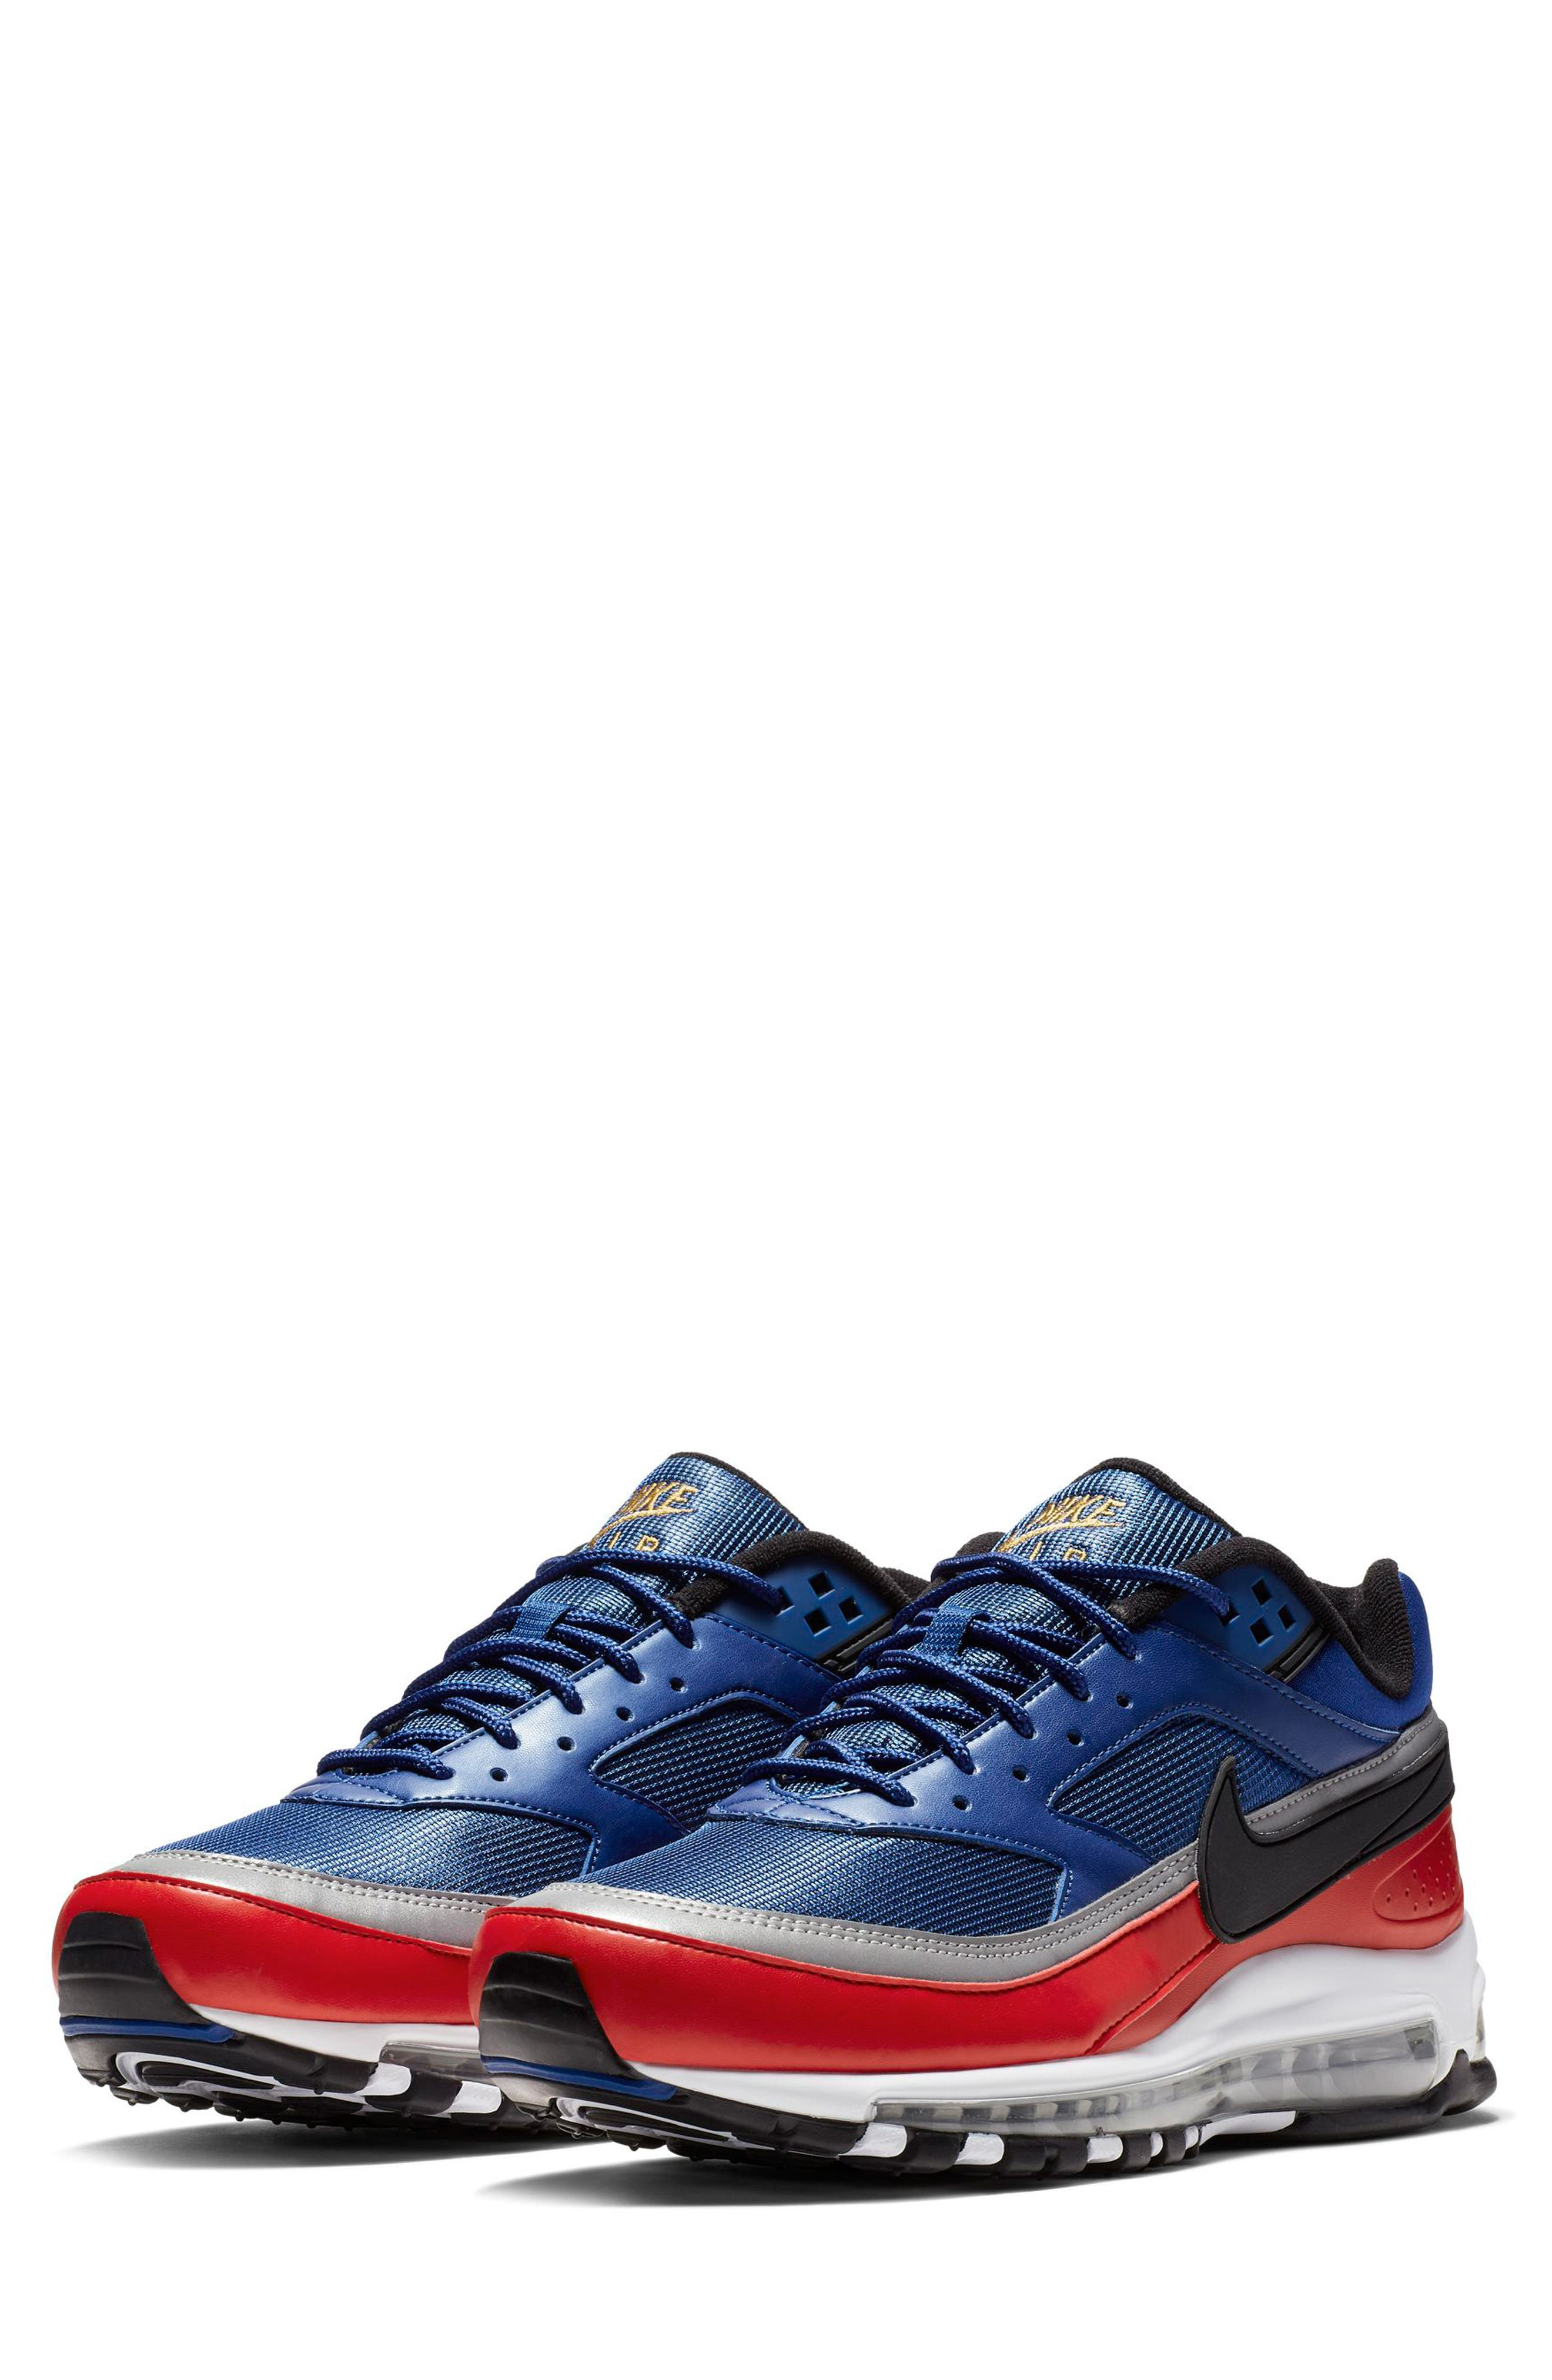 7b0957d819bf3 Nike Blue And Black Shoes Slip On | CONMEBOL